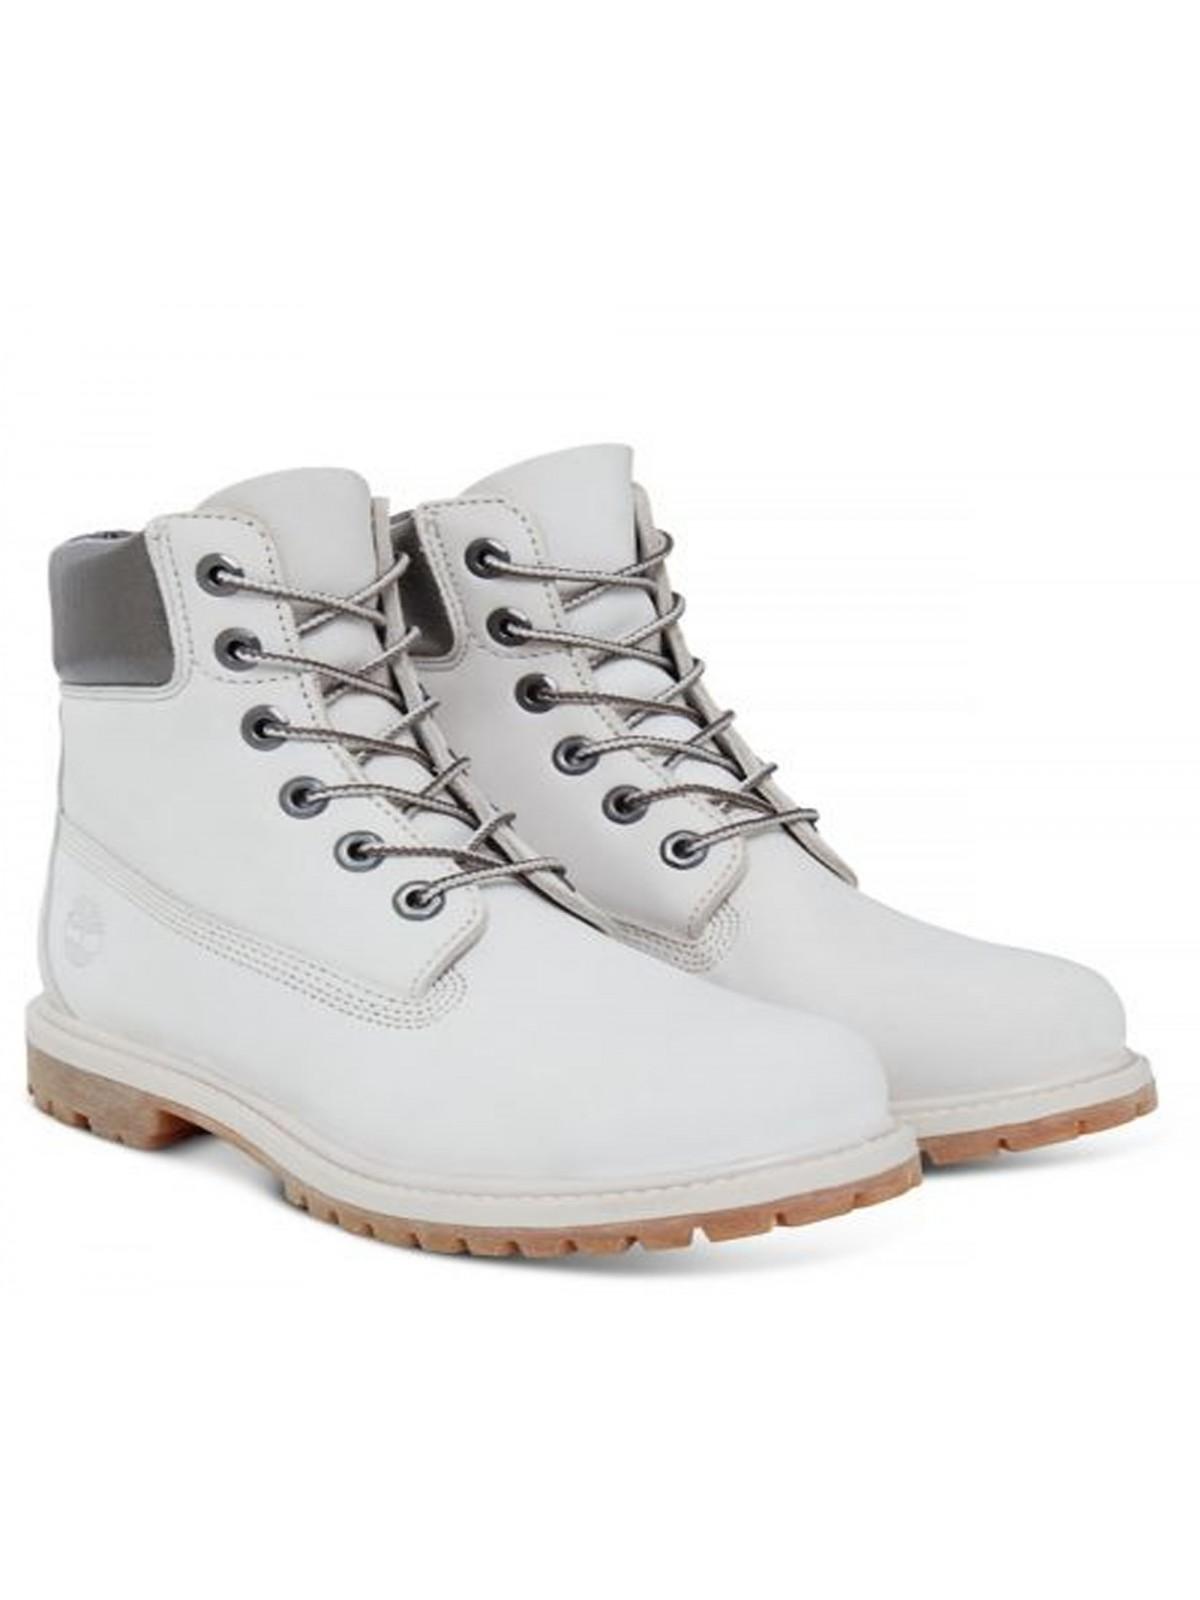 Timberland Icon 6 femme premium boots rainy day